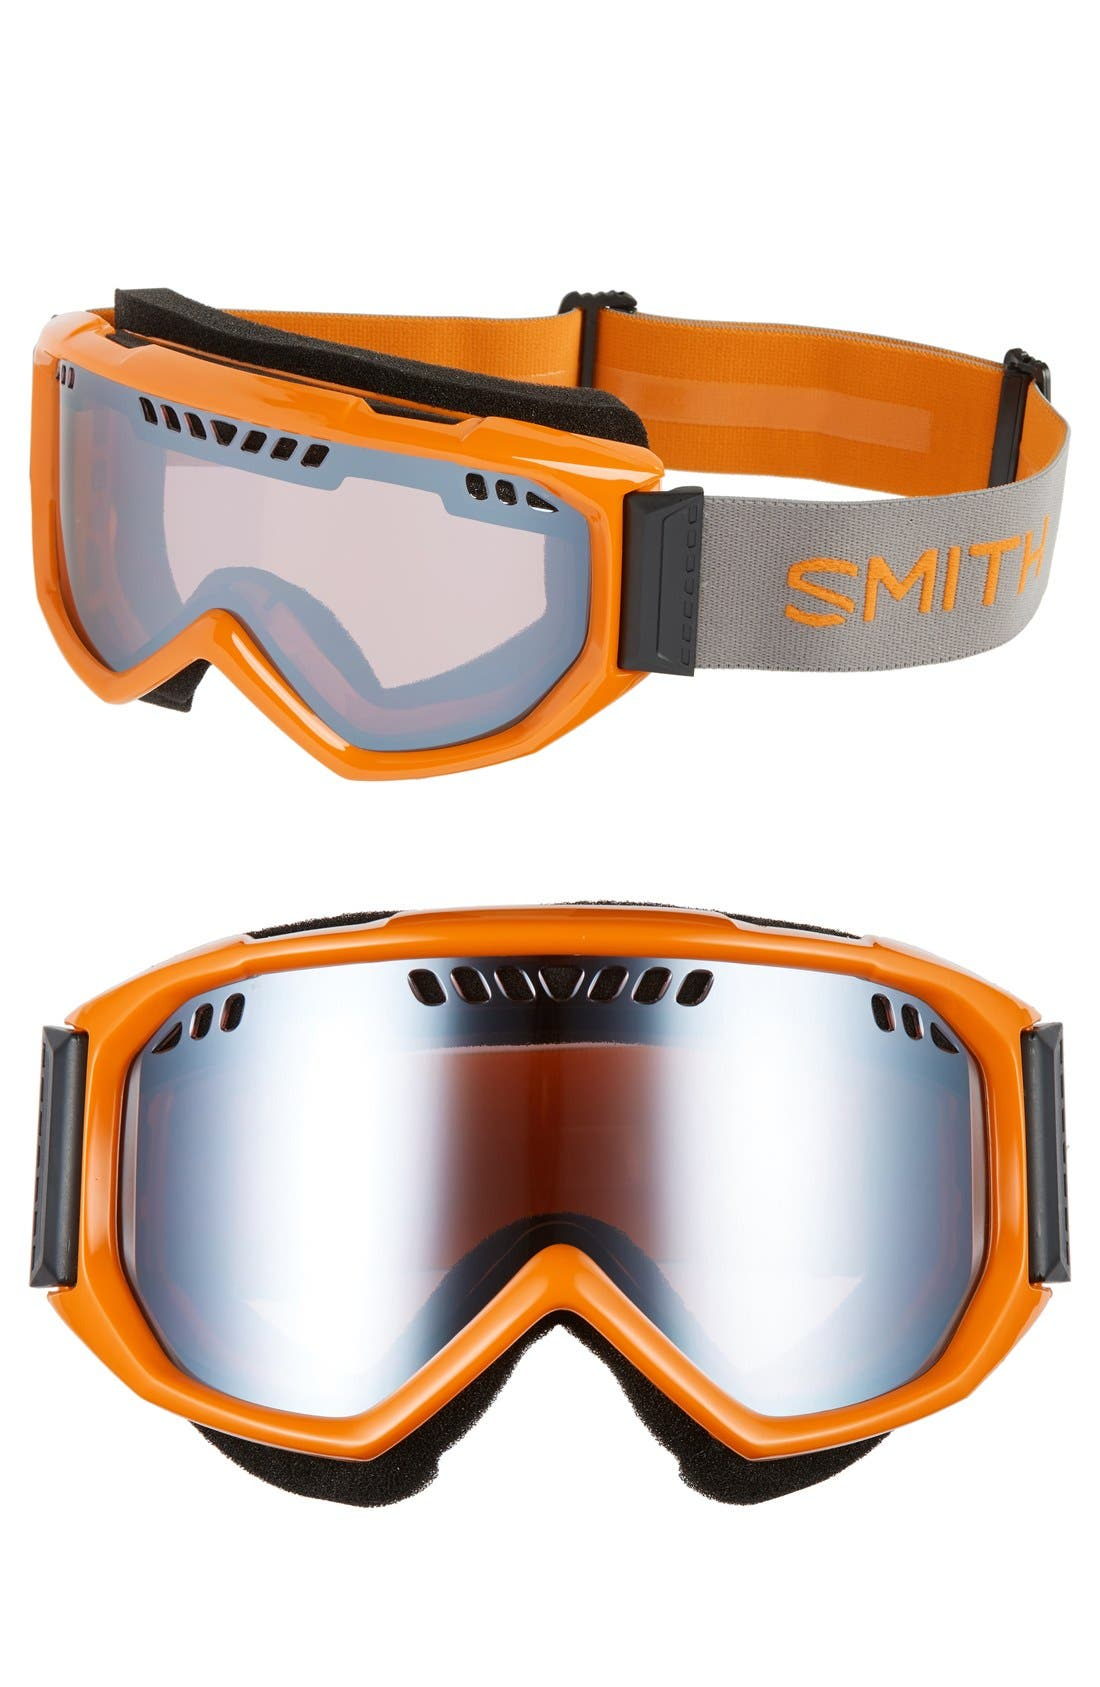 Scope 175mm Snow Goggles,                         Main,                         color, Solar